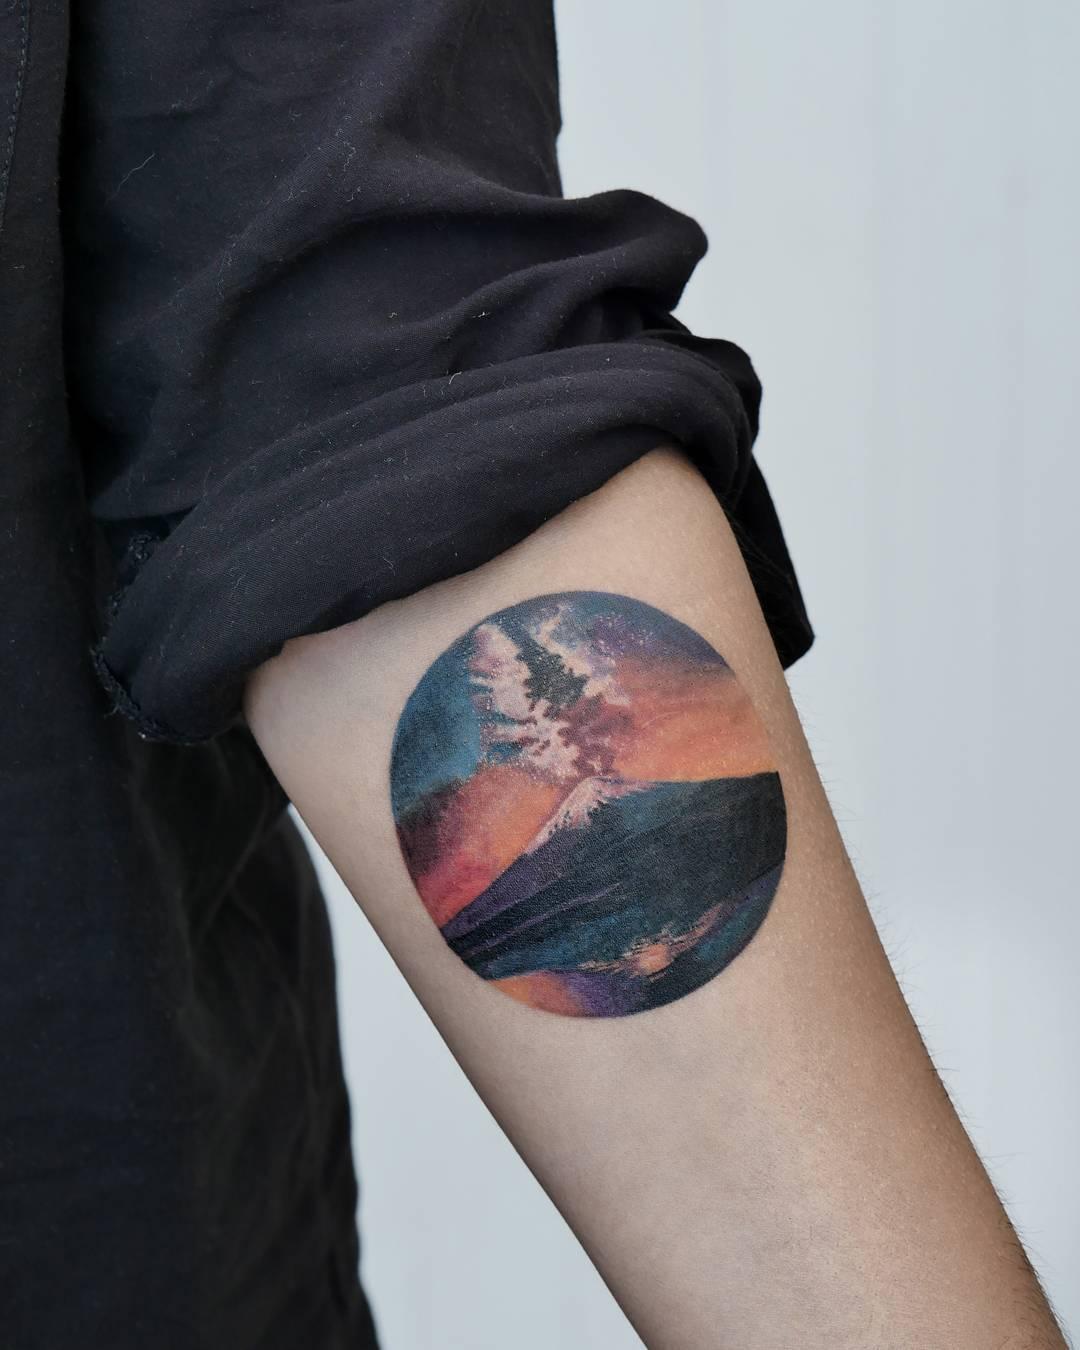 Mountain and night sky by Rey Jasper